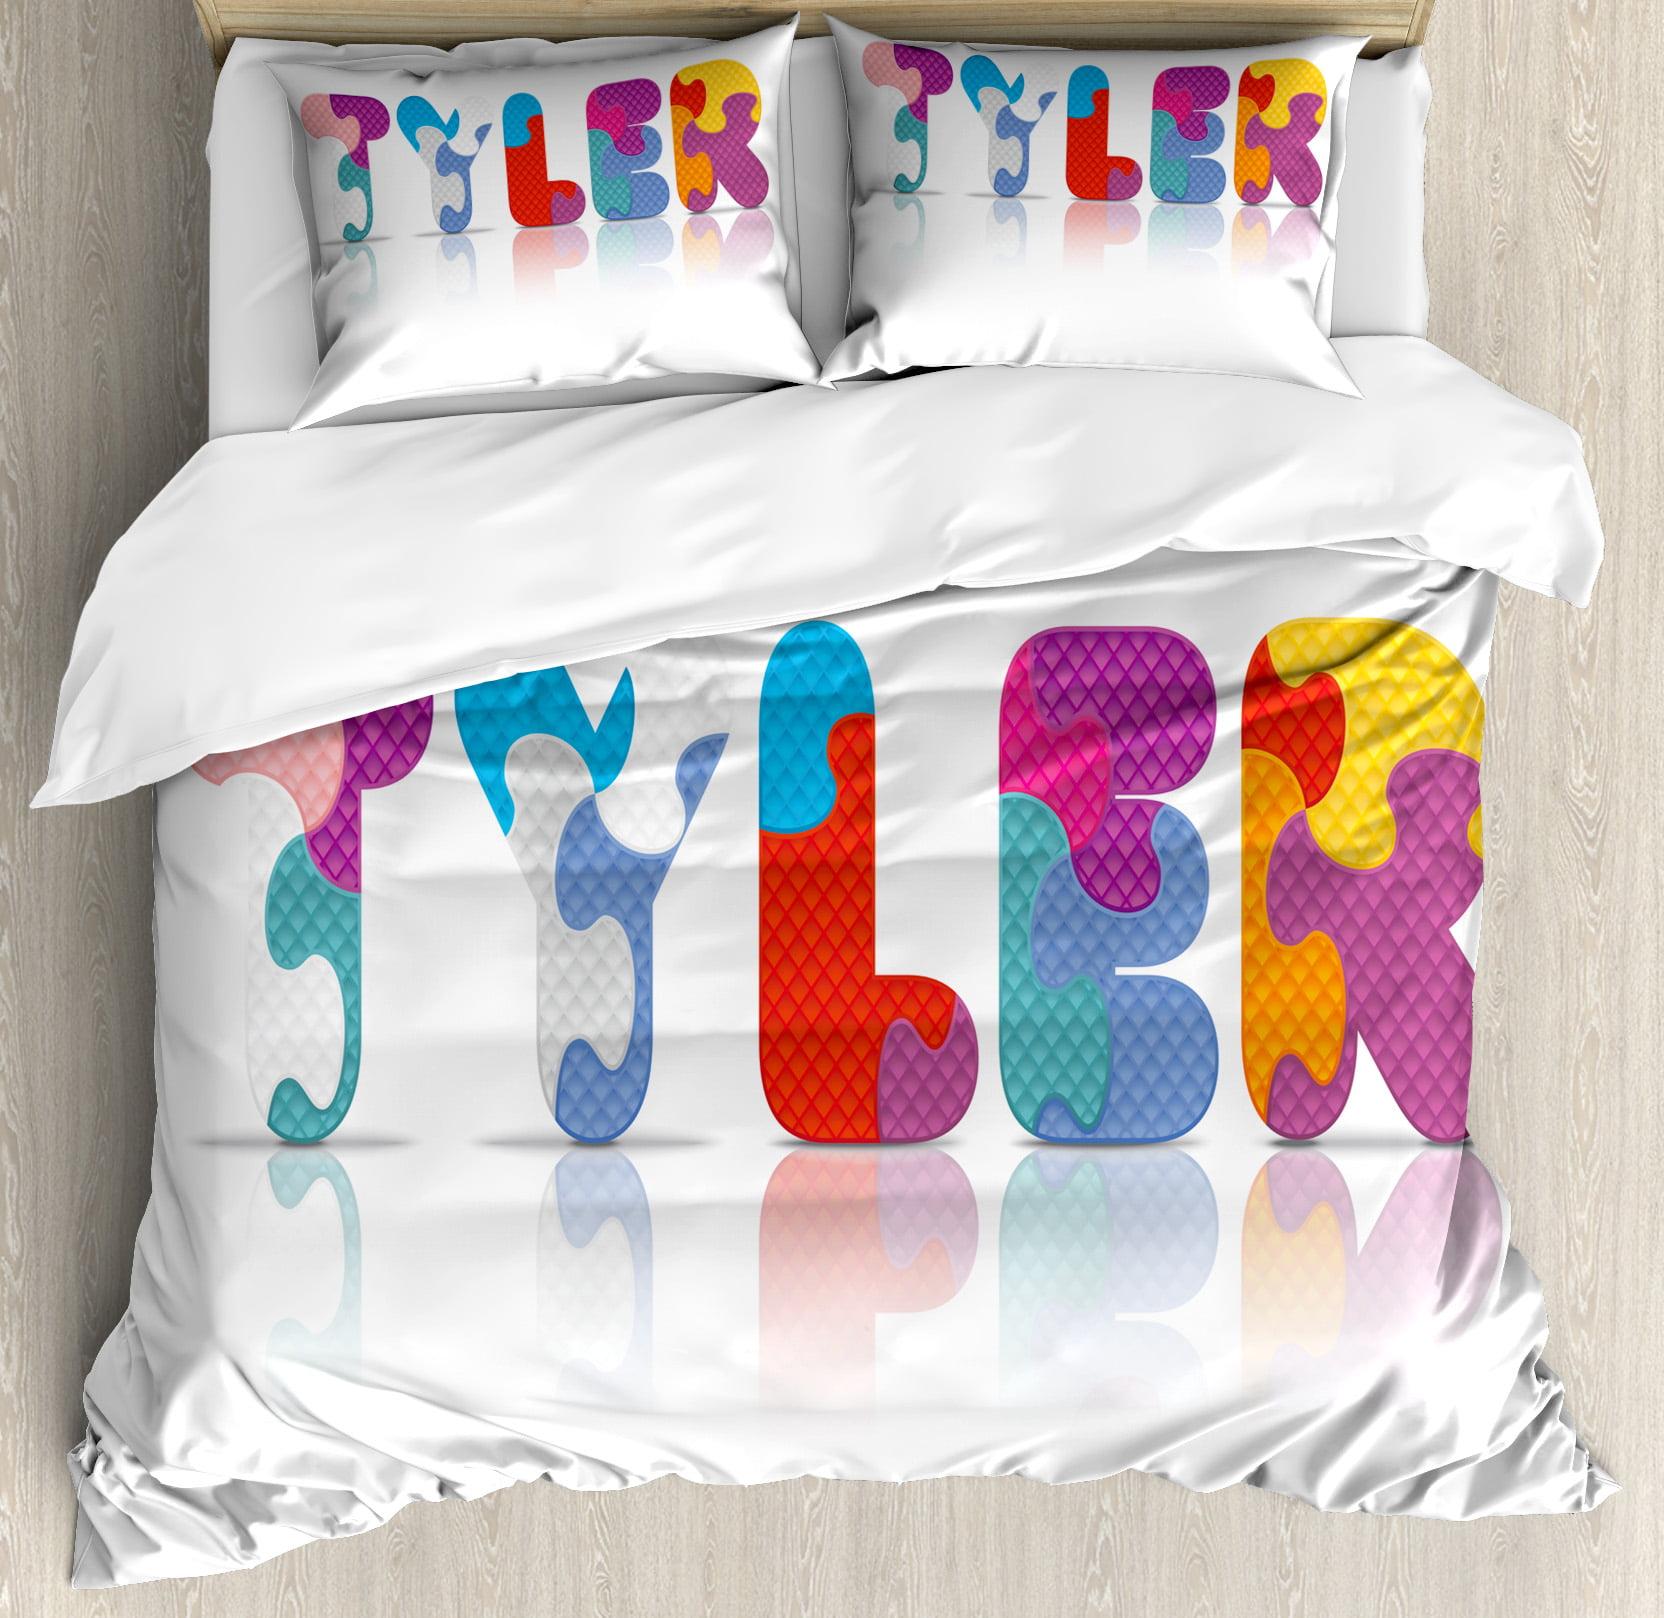 Tyler King Size Duvet Cover Set, Composition of Kindergarten Themed Colorful Letter Arrangement Newborn... by Kozmos